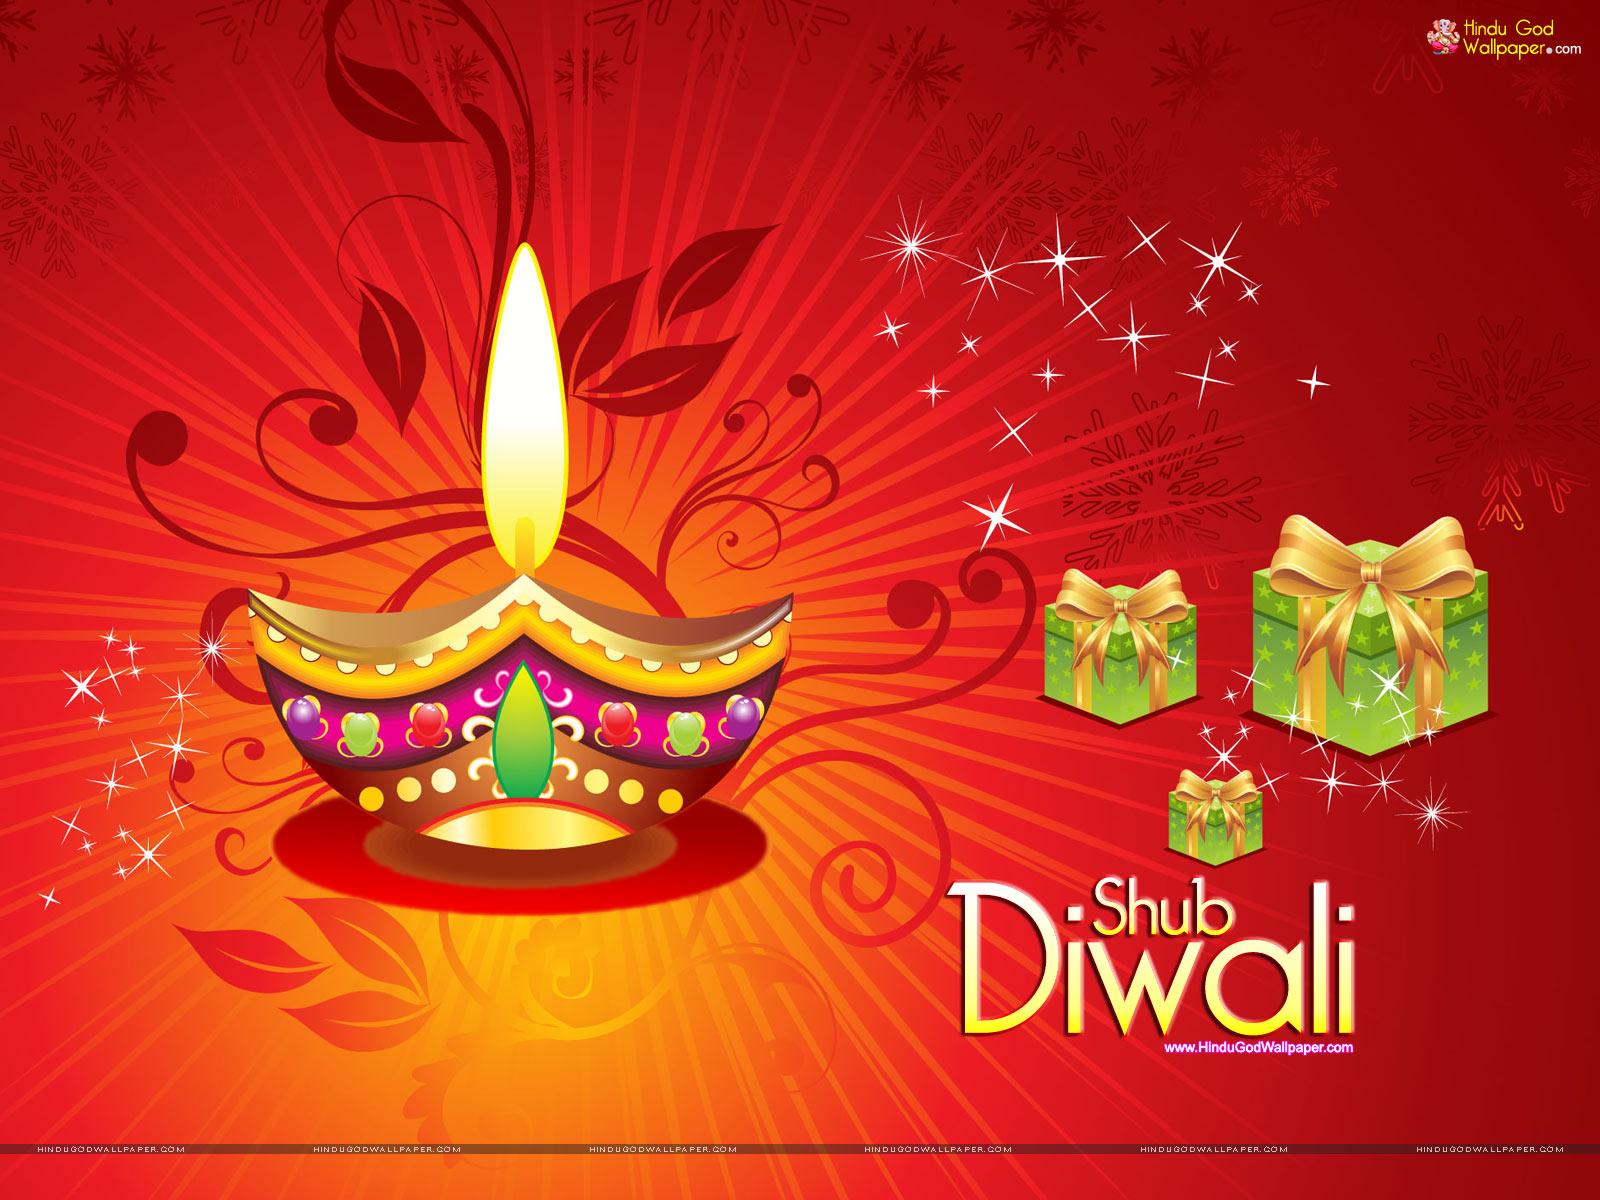 Diwali Special Wallpaper HD Quality Free Download